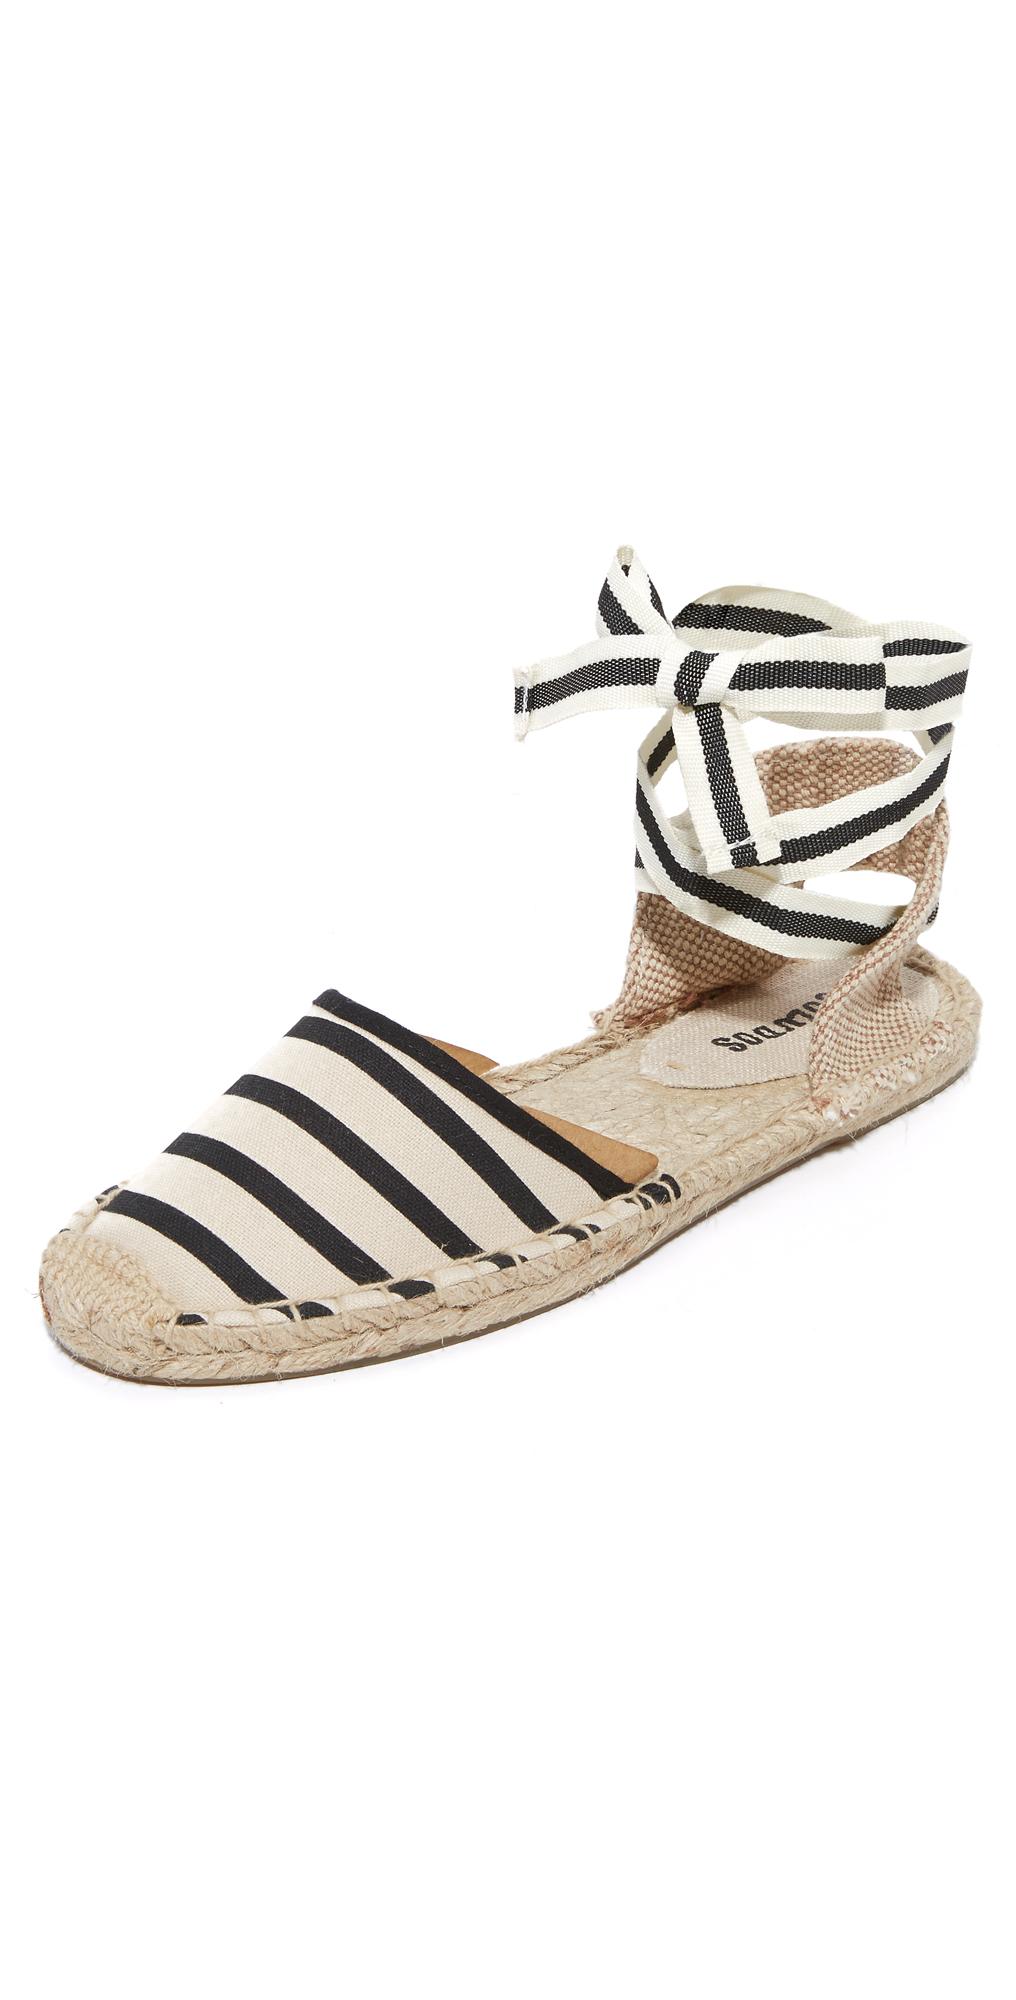 Striped Espadrille Sandals Soludos